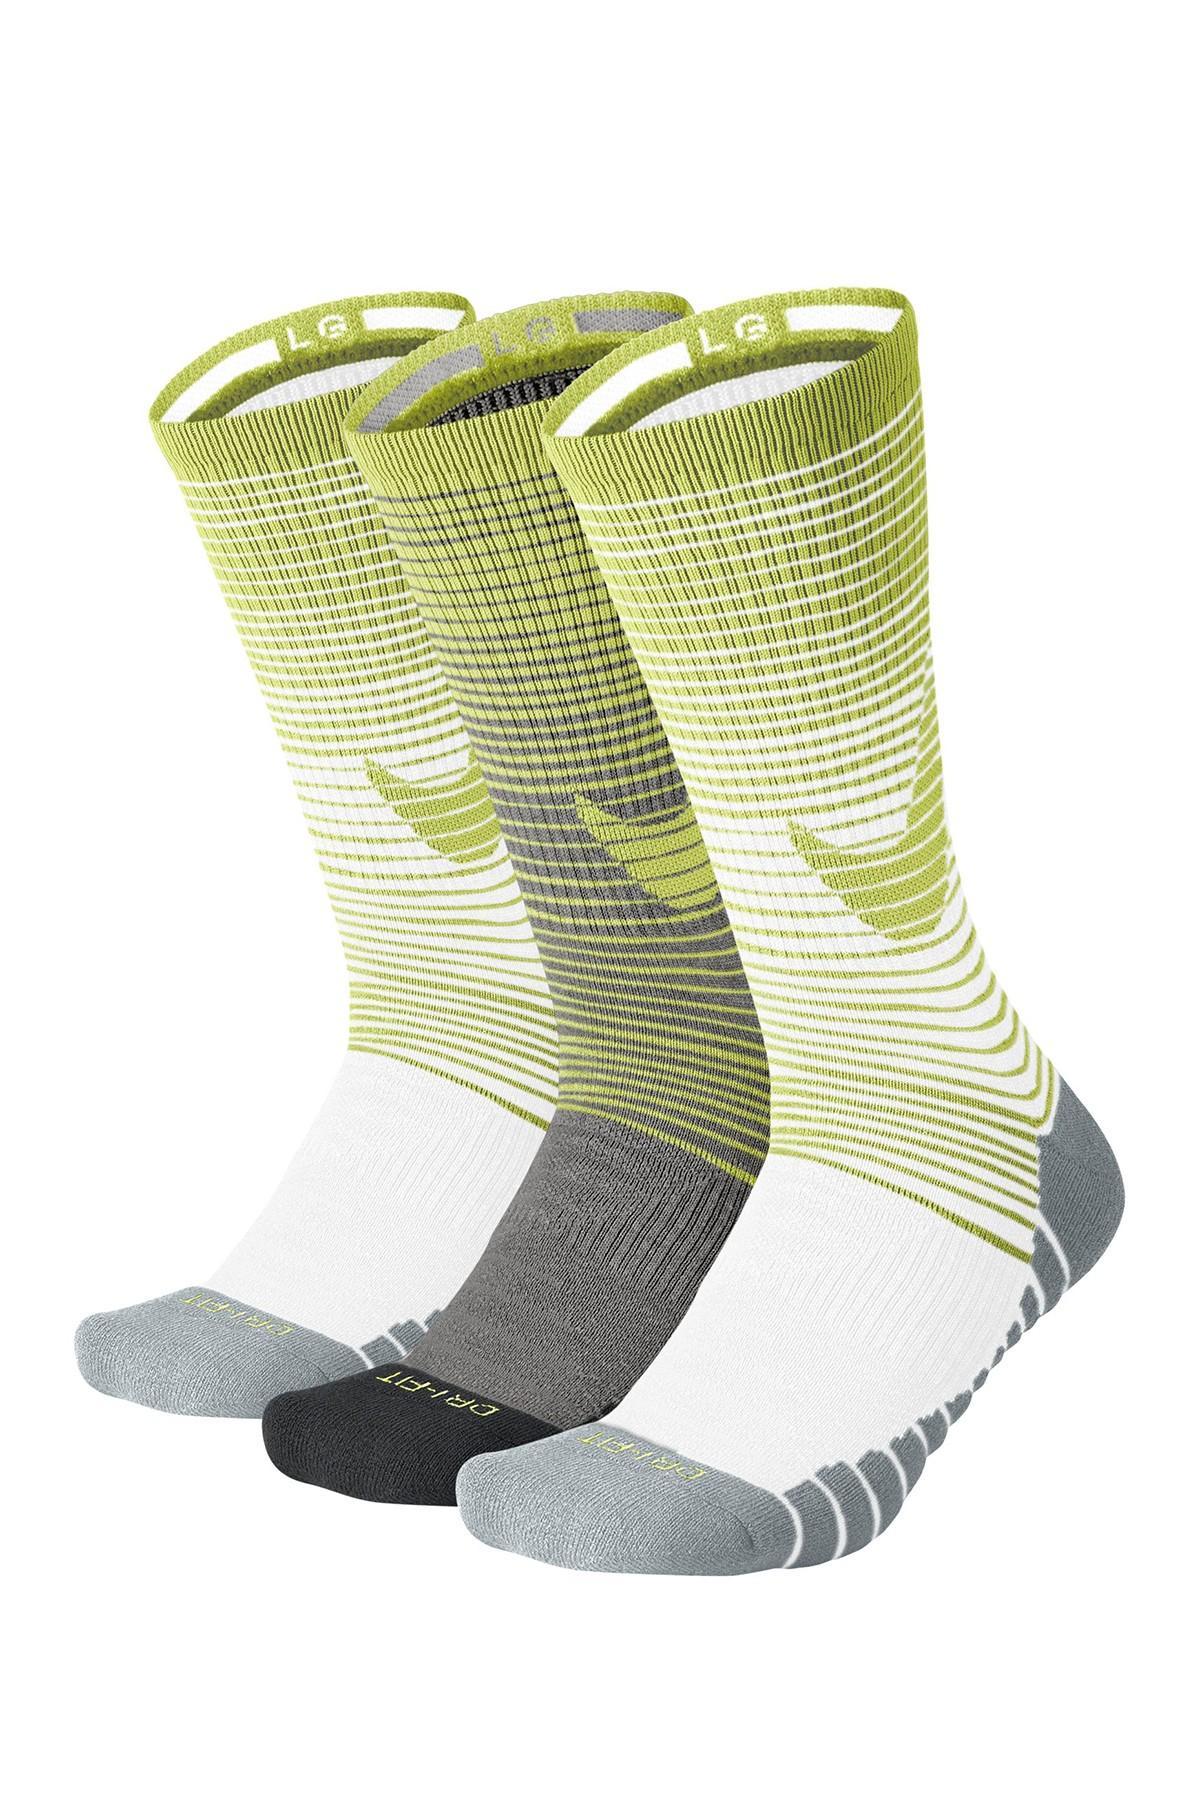 Lyst - Nike Dri-fit Performance Cushioned Crew Socks - Pack Of 3 in